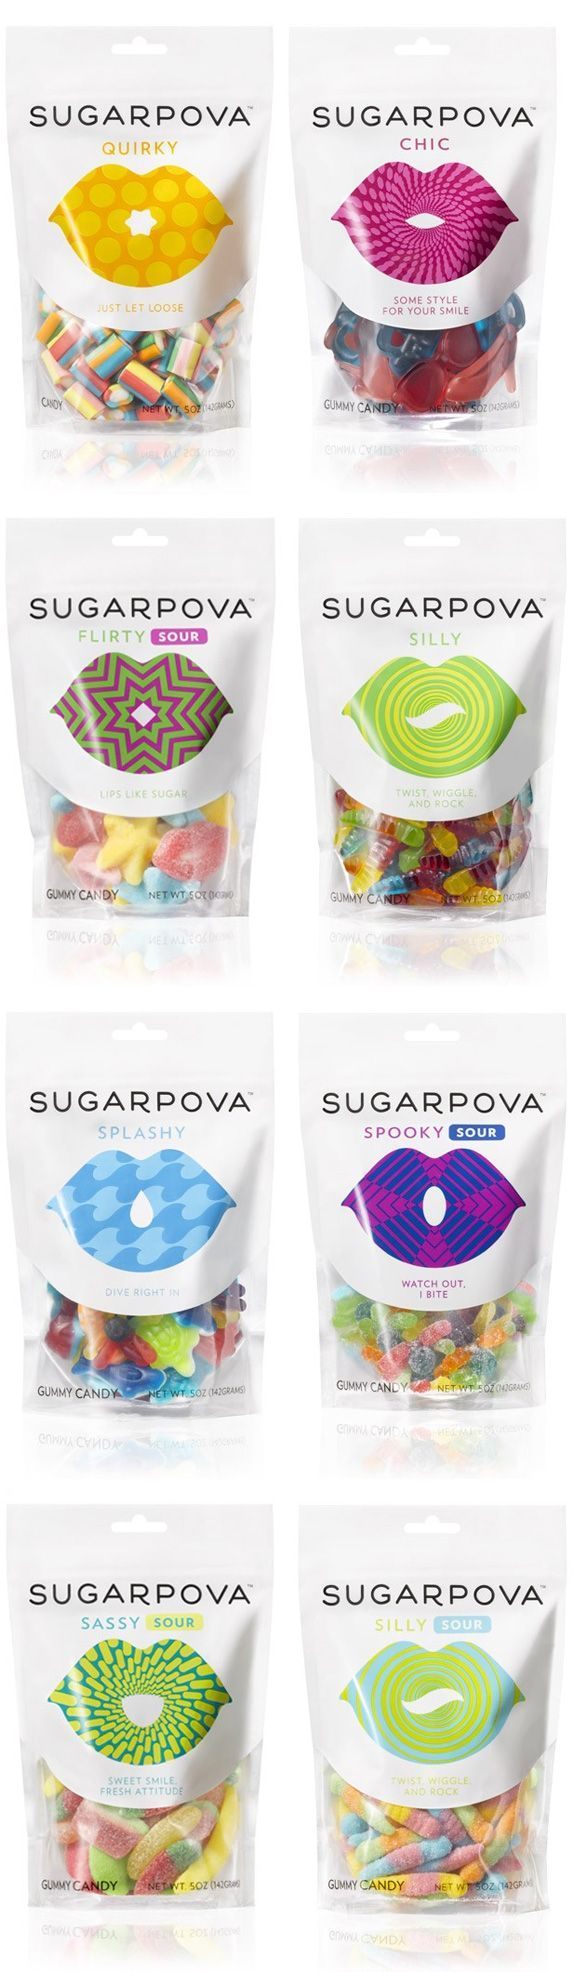 Sugarpova Logo and Packaging